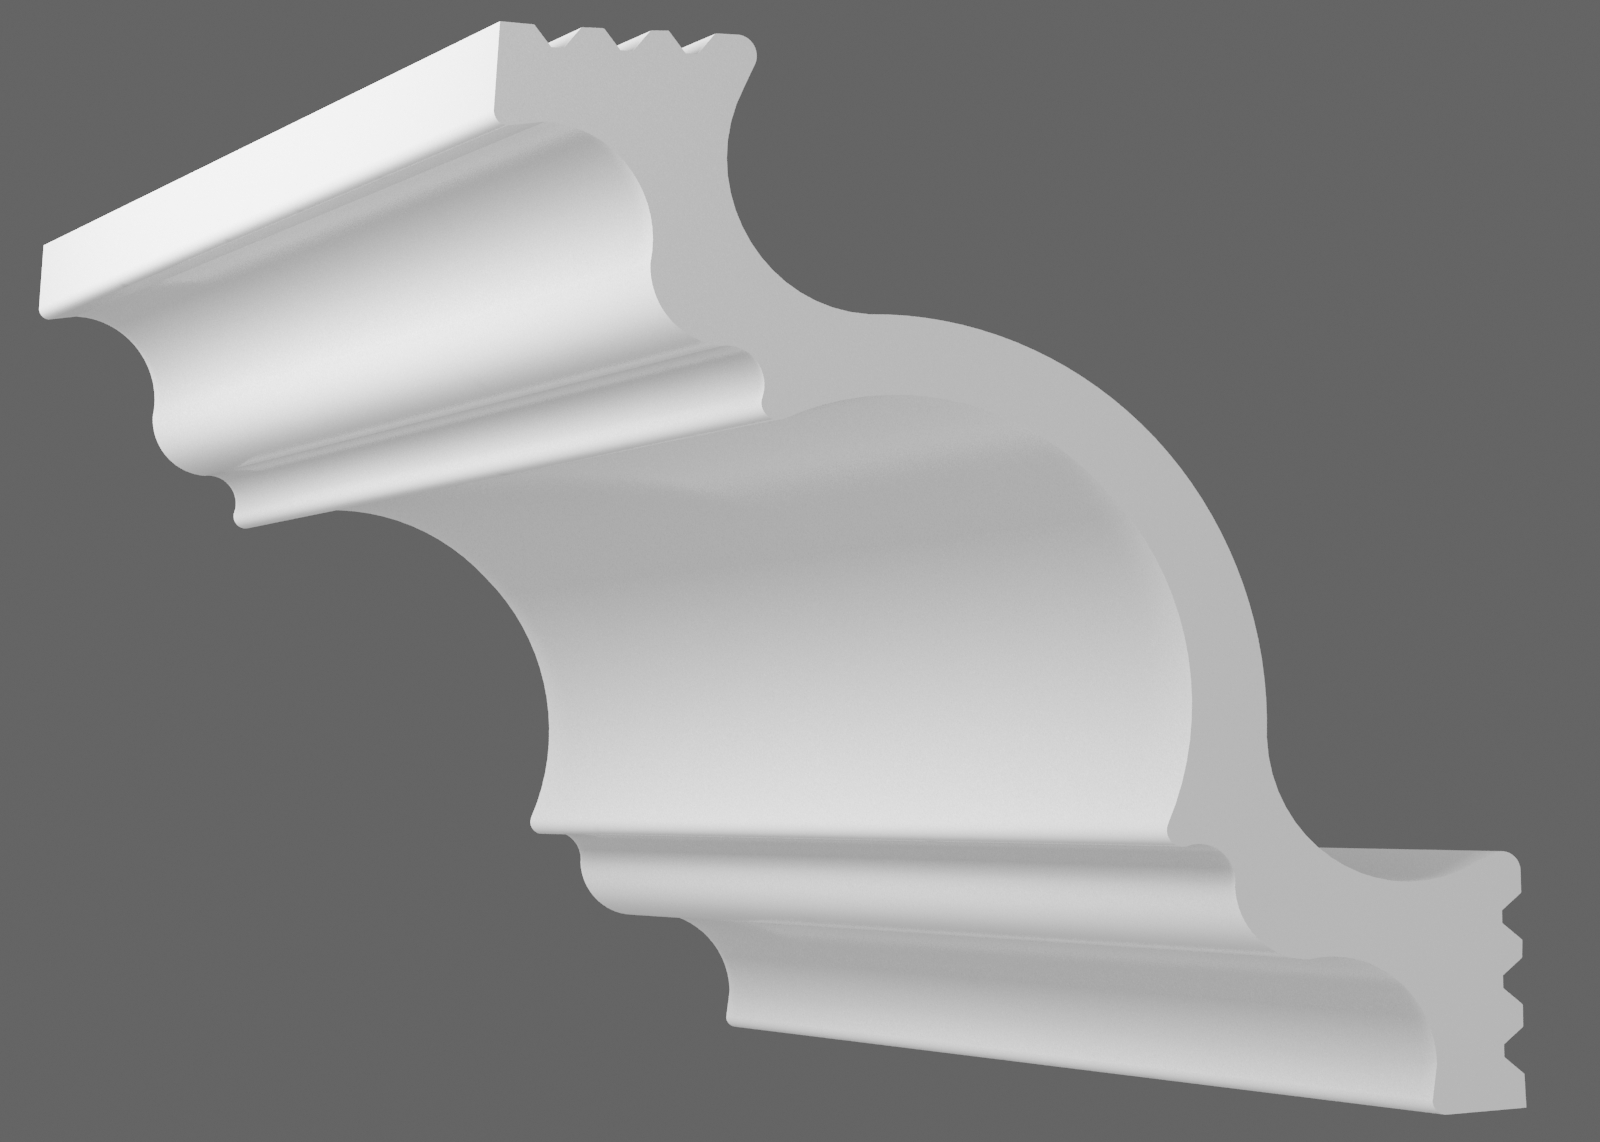 Потолочный плинтус К-100 (Размер:75х75мм)